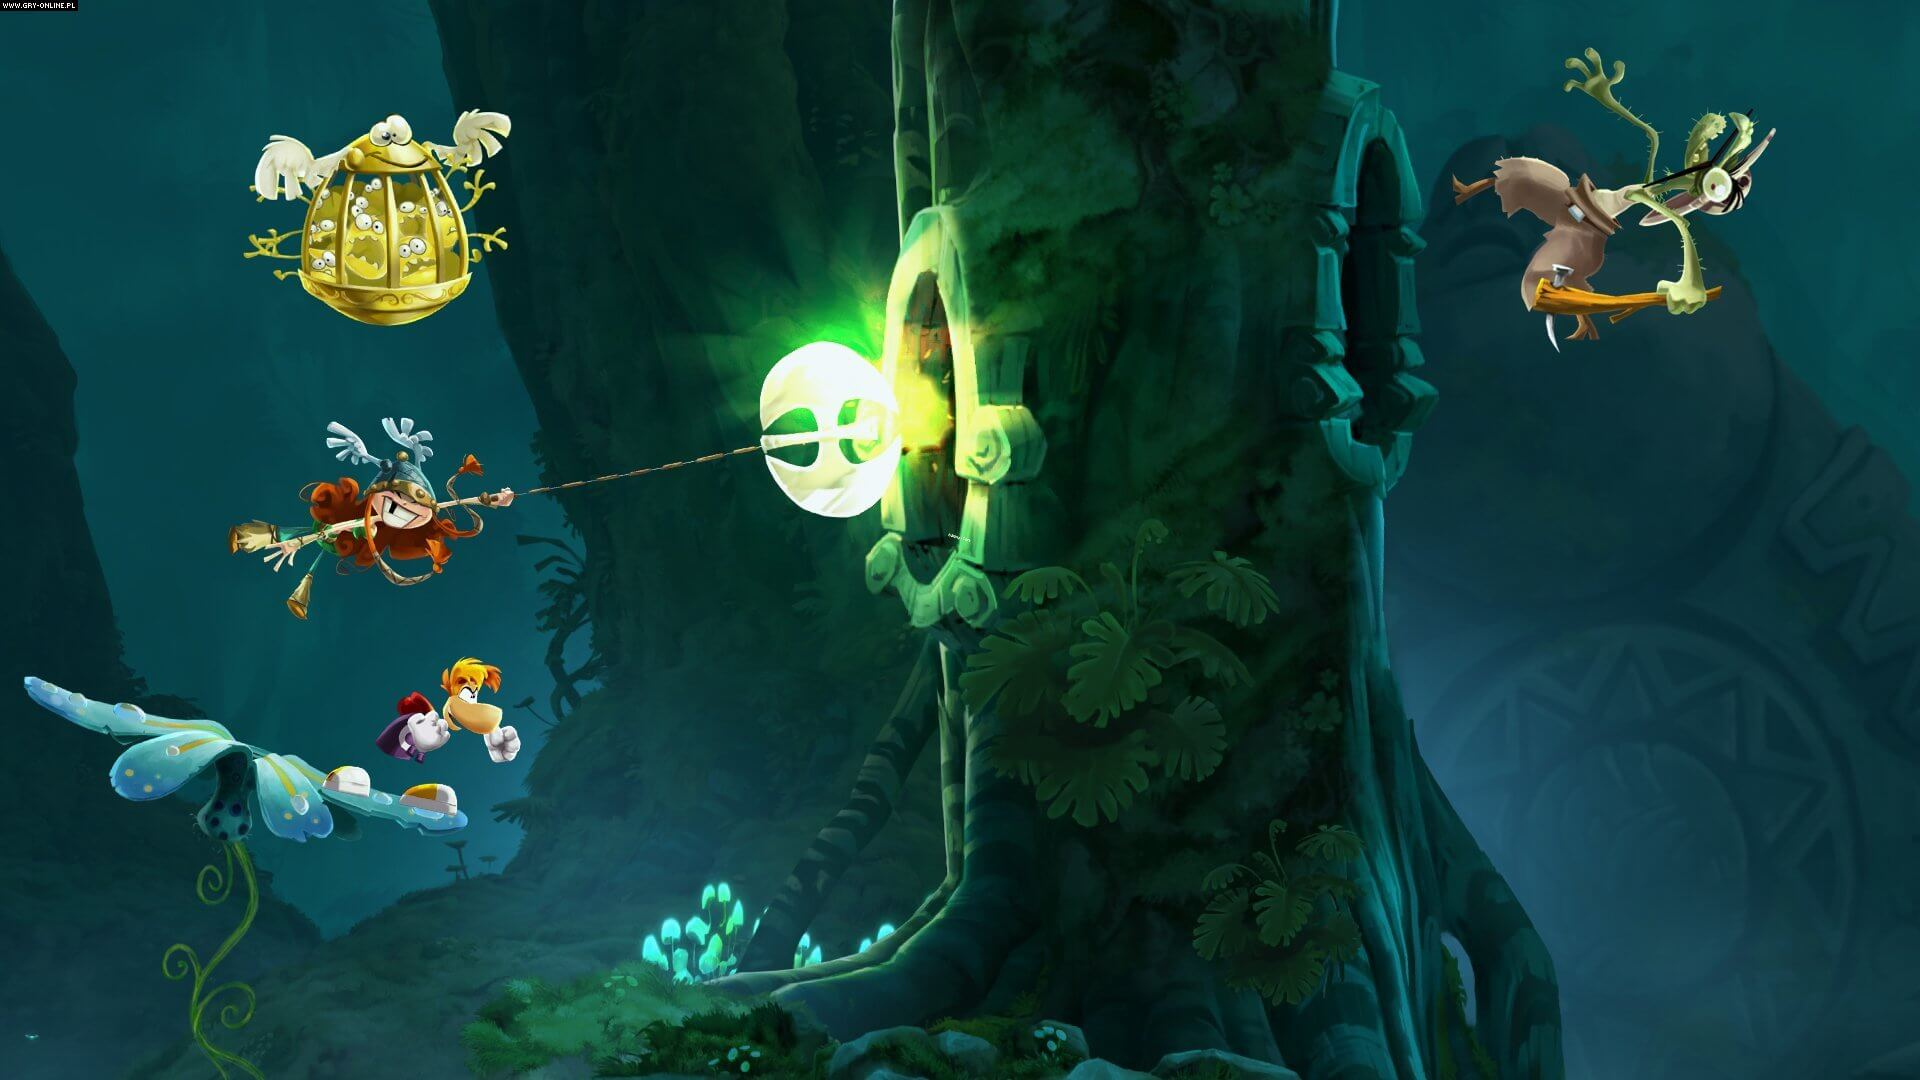 Rayman Legends Gameplay Screenshot 2